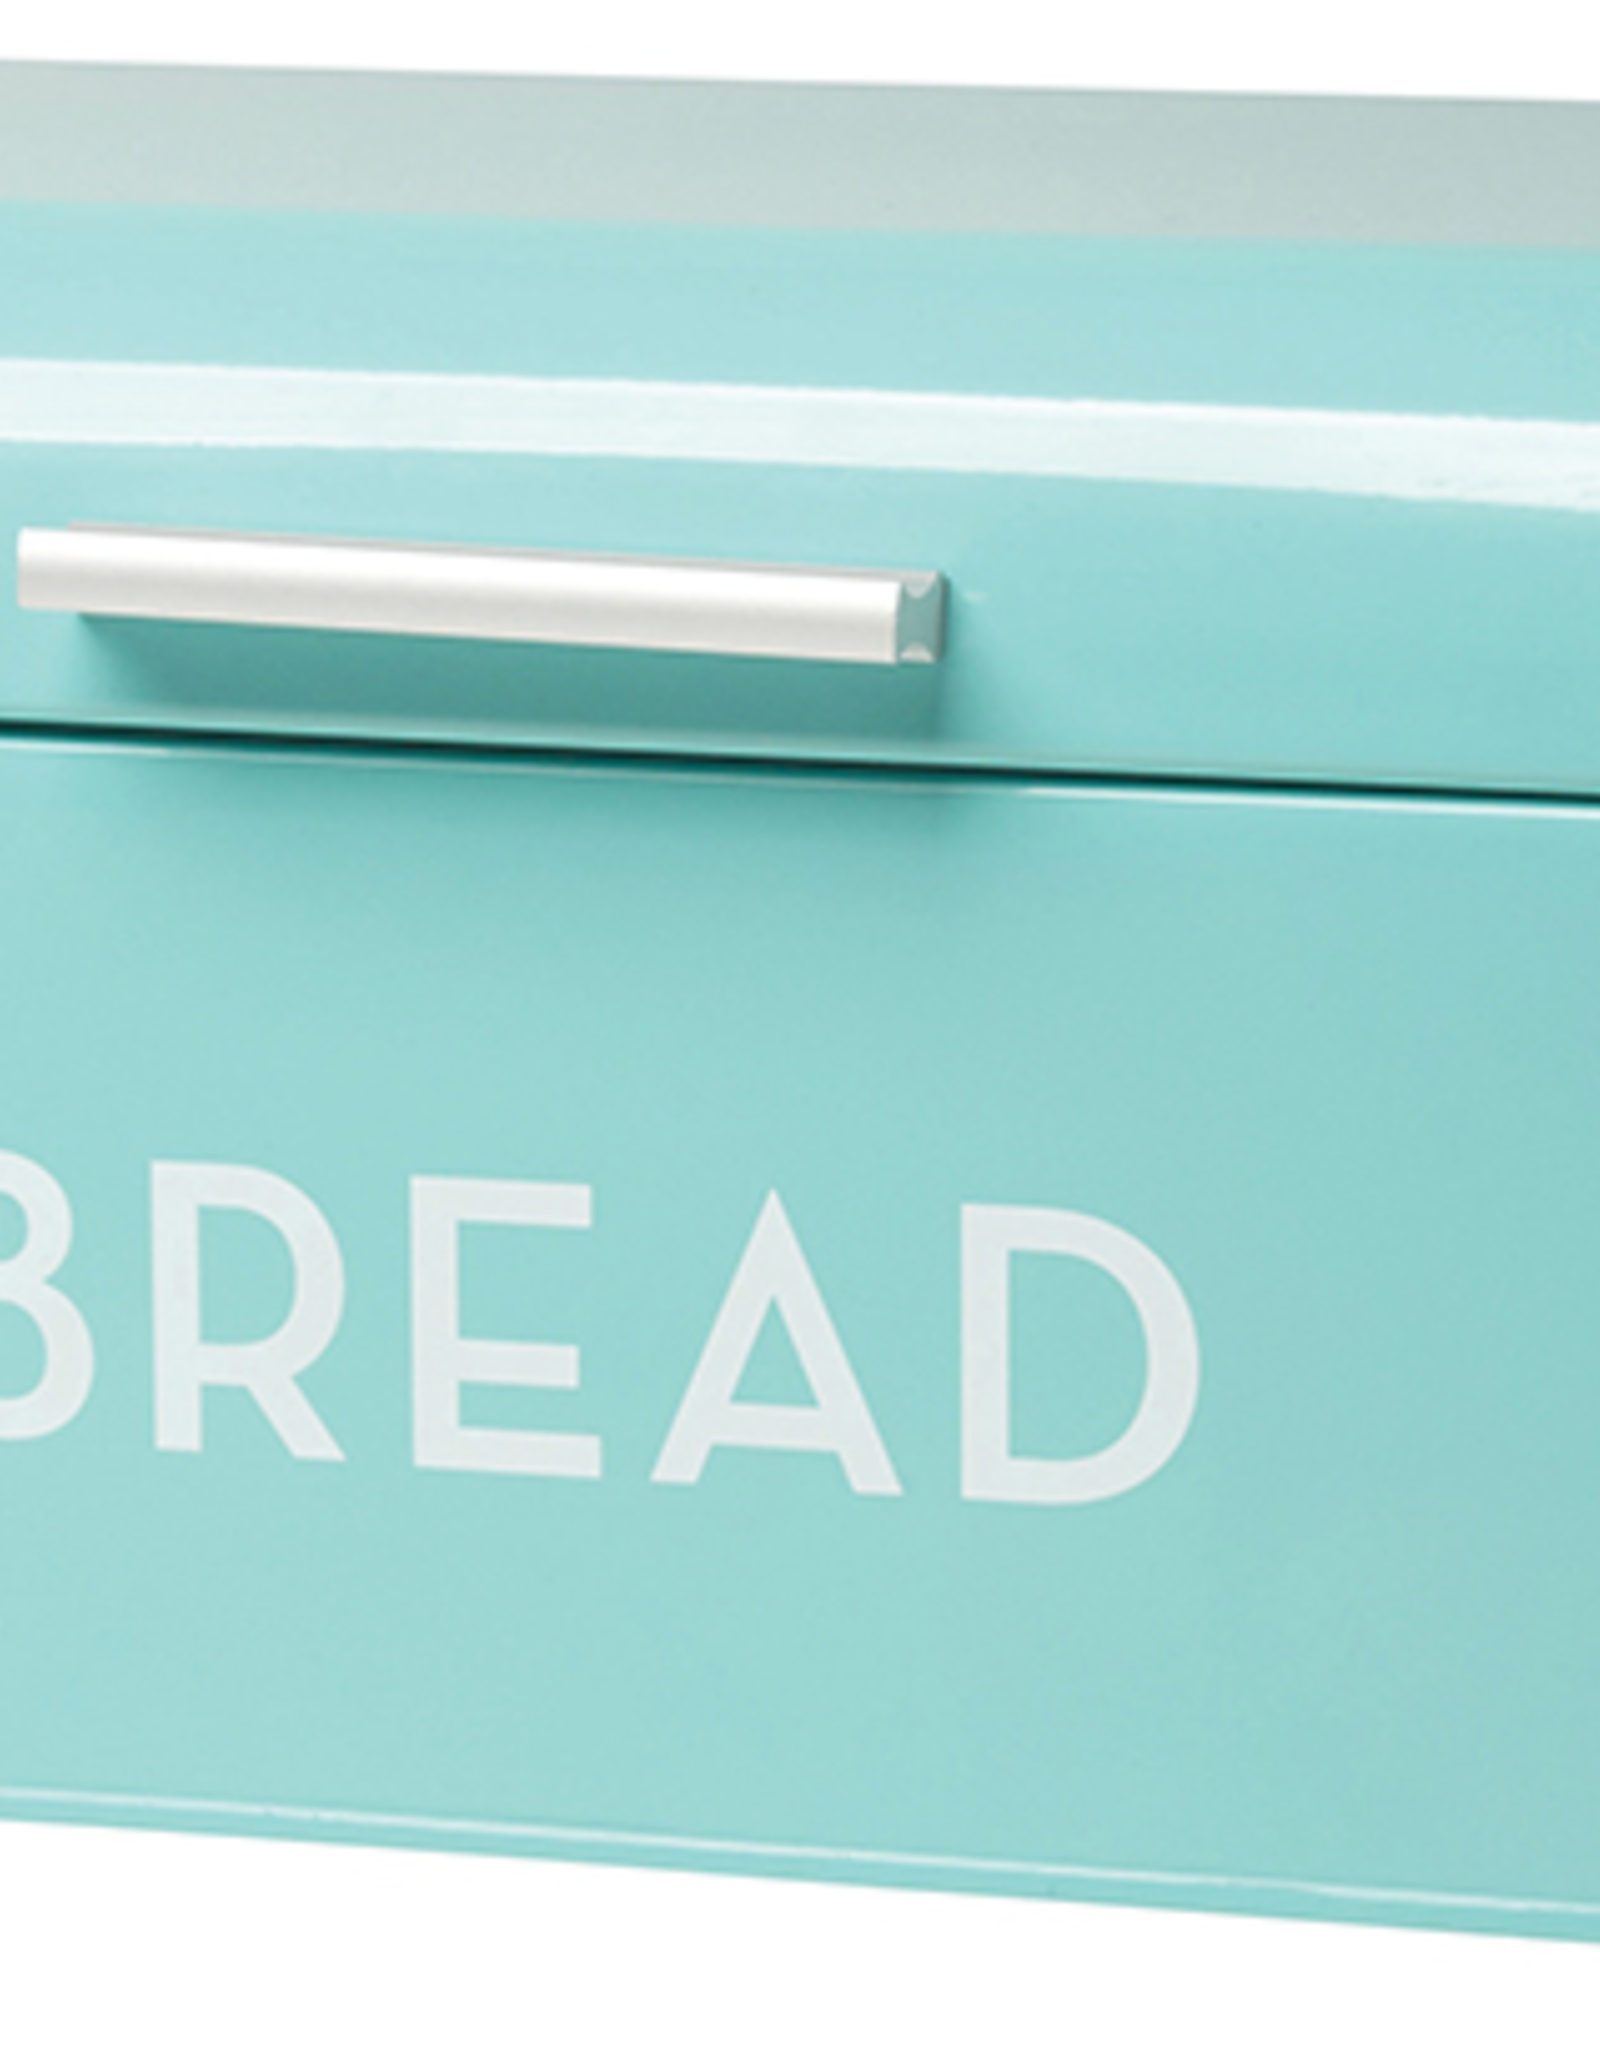 Bread Bin Turquoise, Large